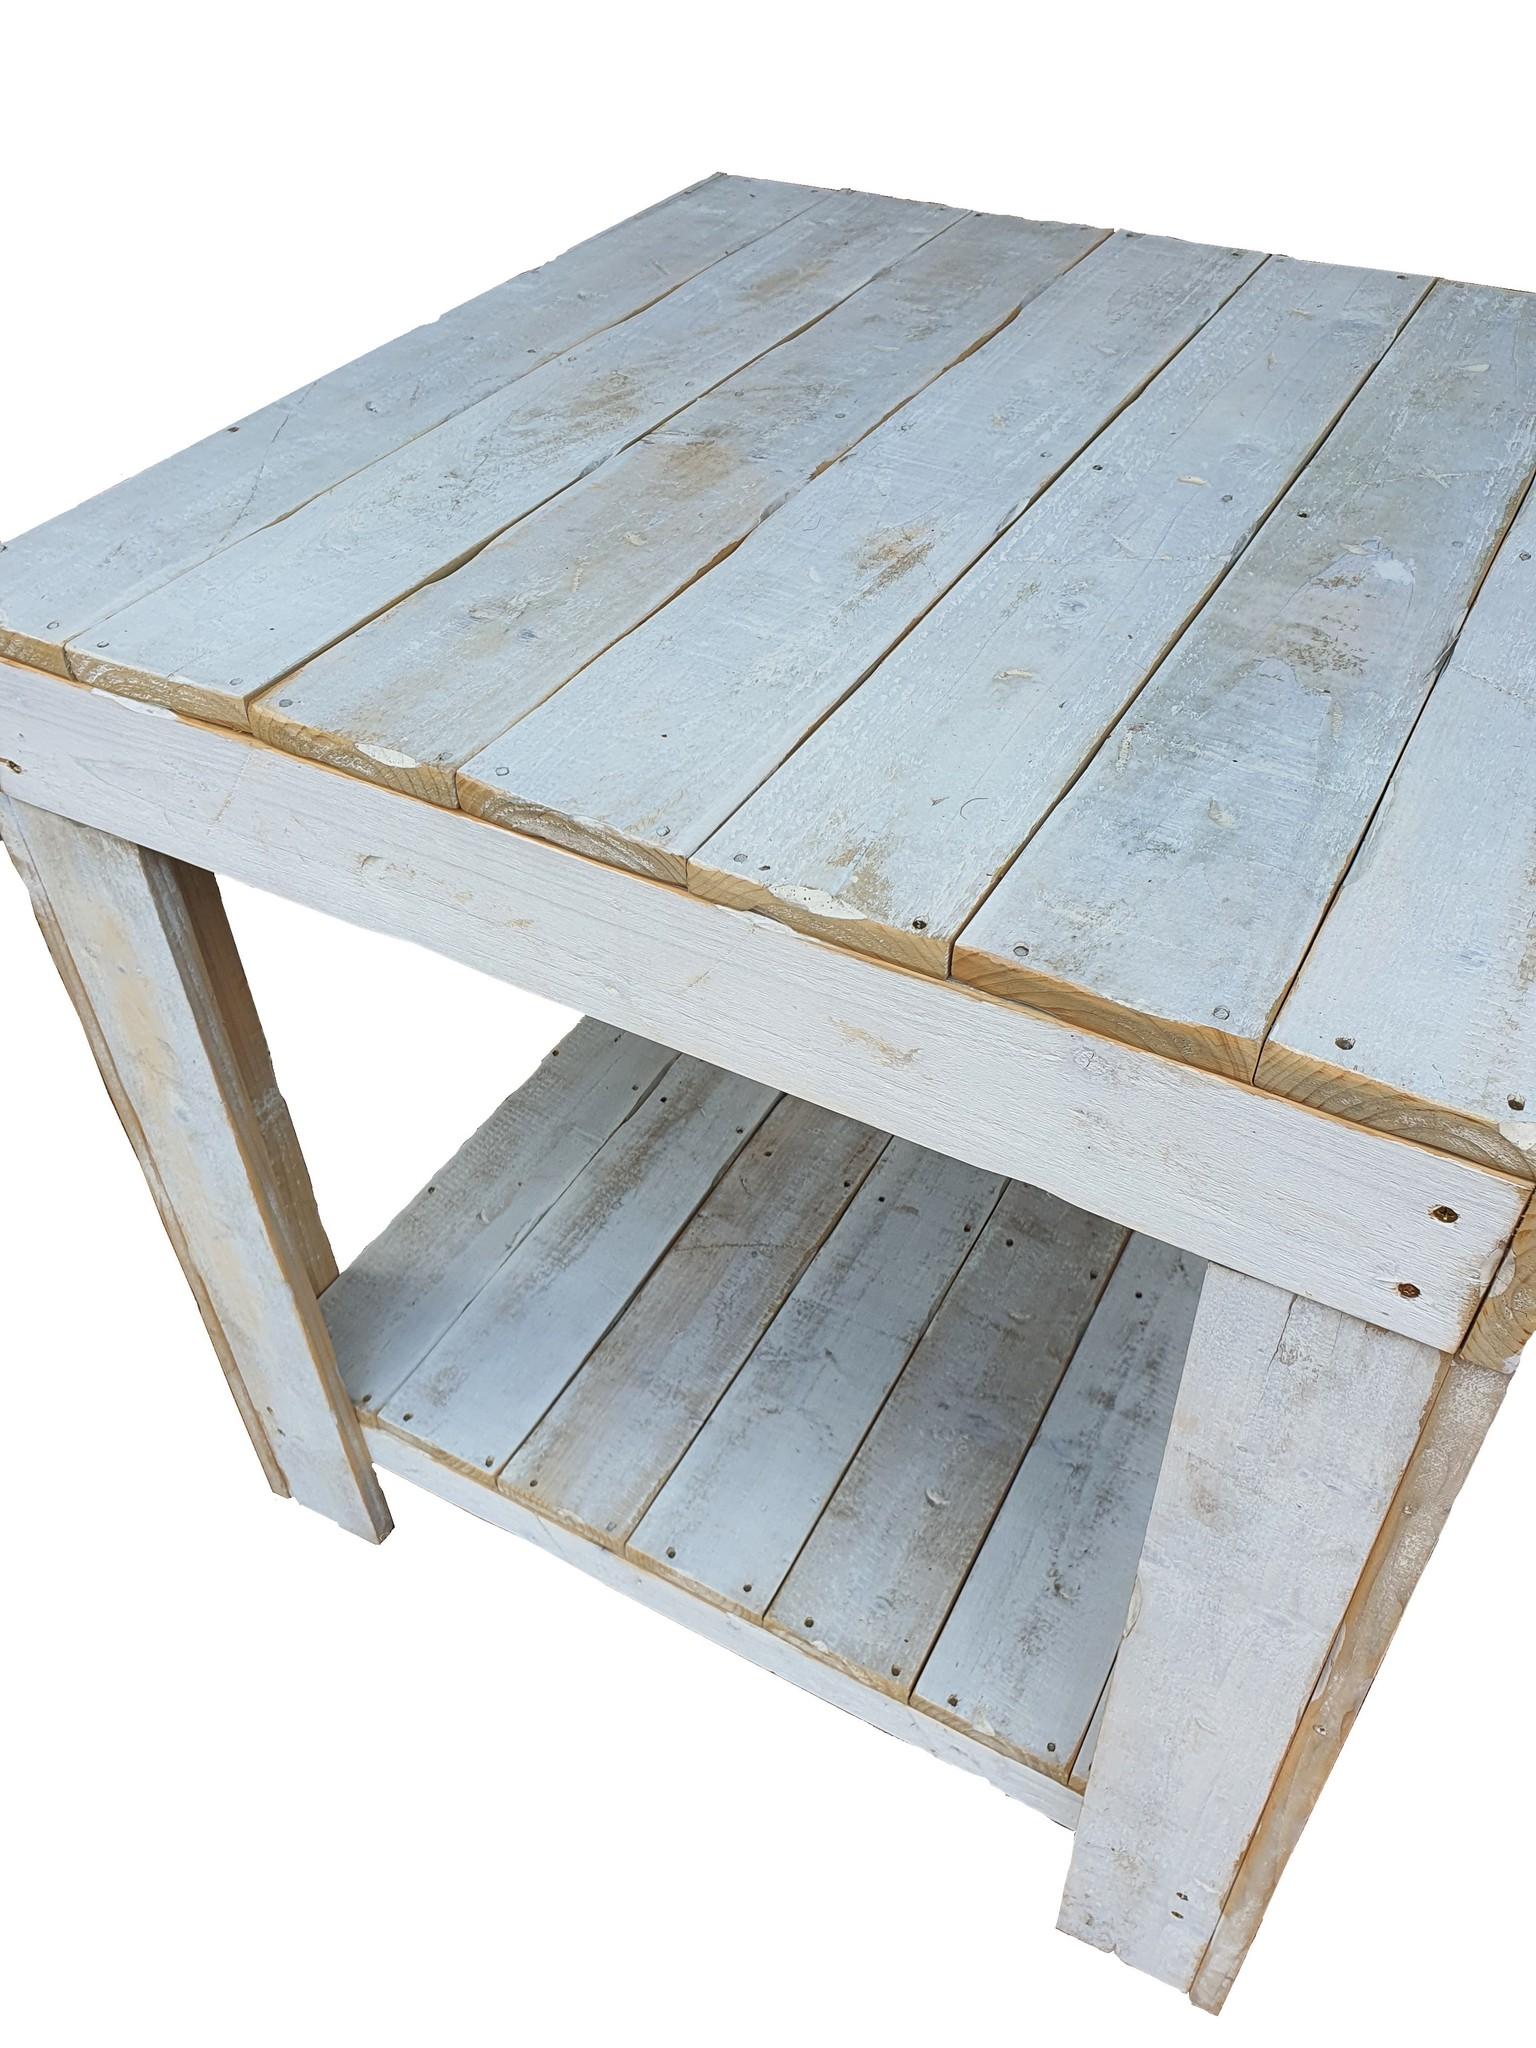 shop int ibiza white table double 78-4